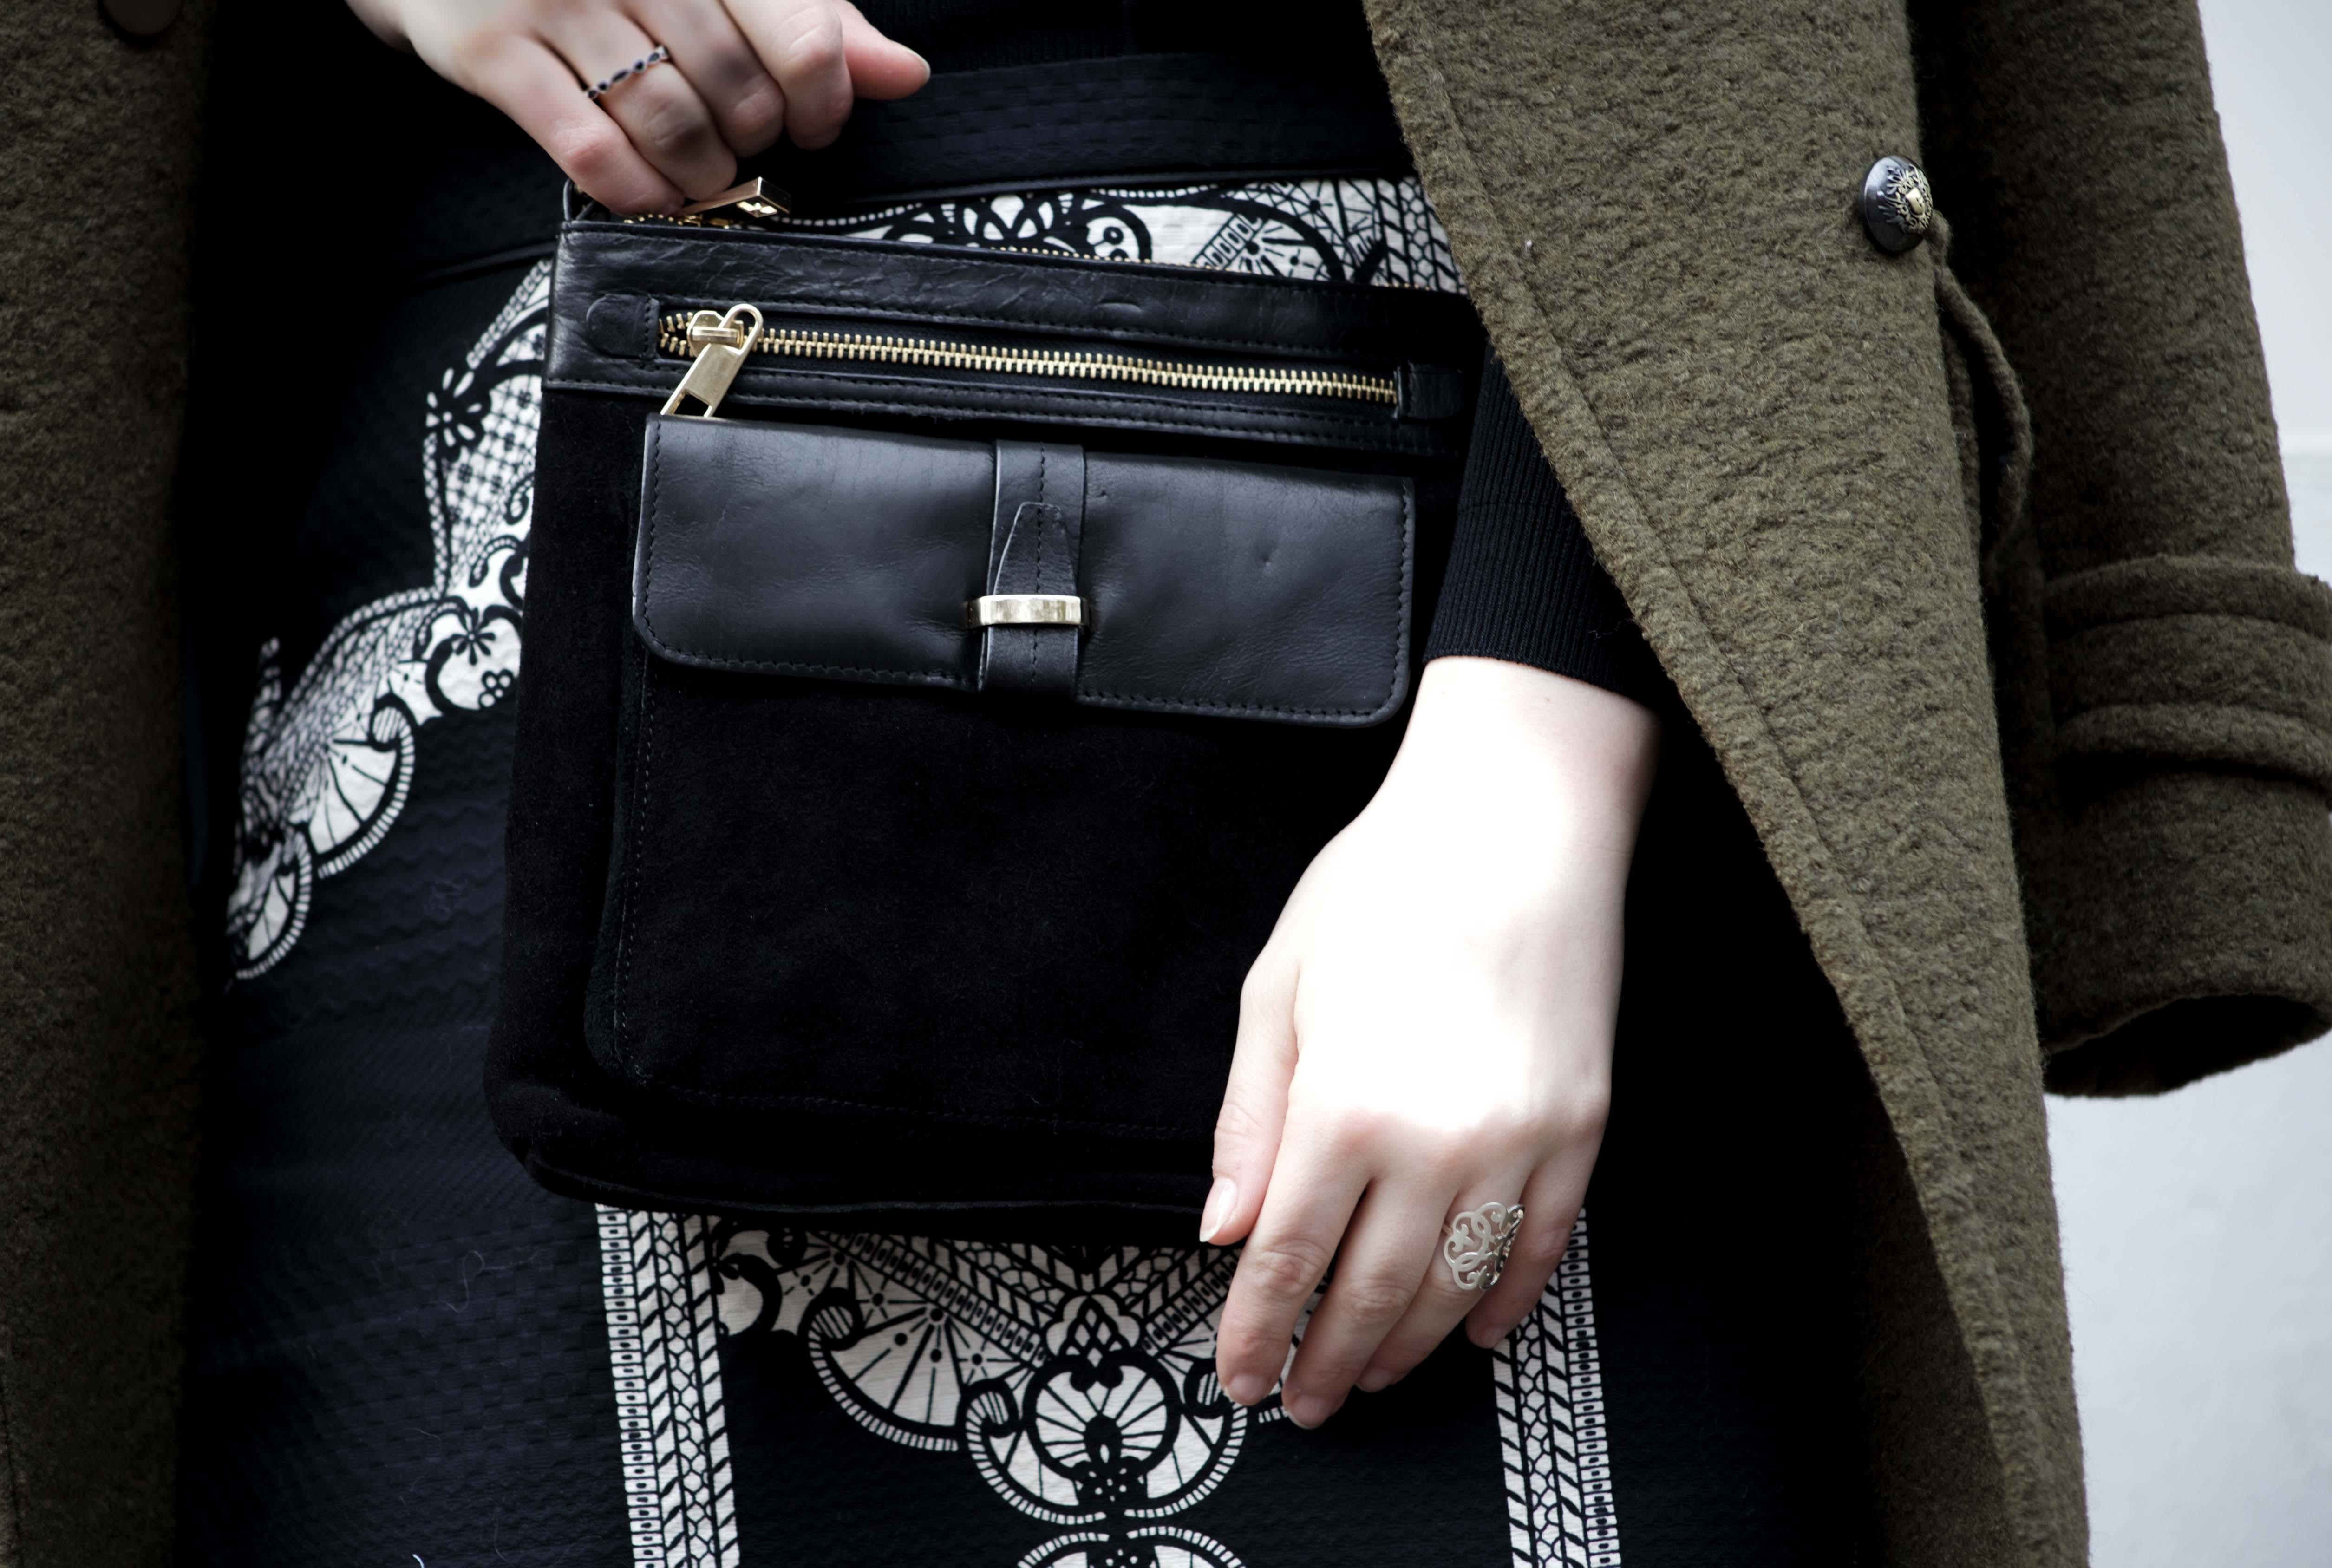 streetstyle-bonn-waldgrüner-mantel-rock-muster-print-fashionblogger-modeblog-mode-outfit_0142